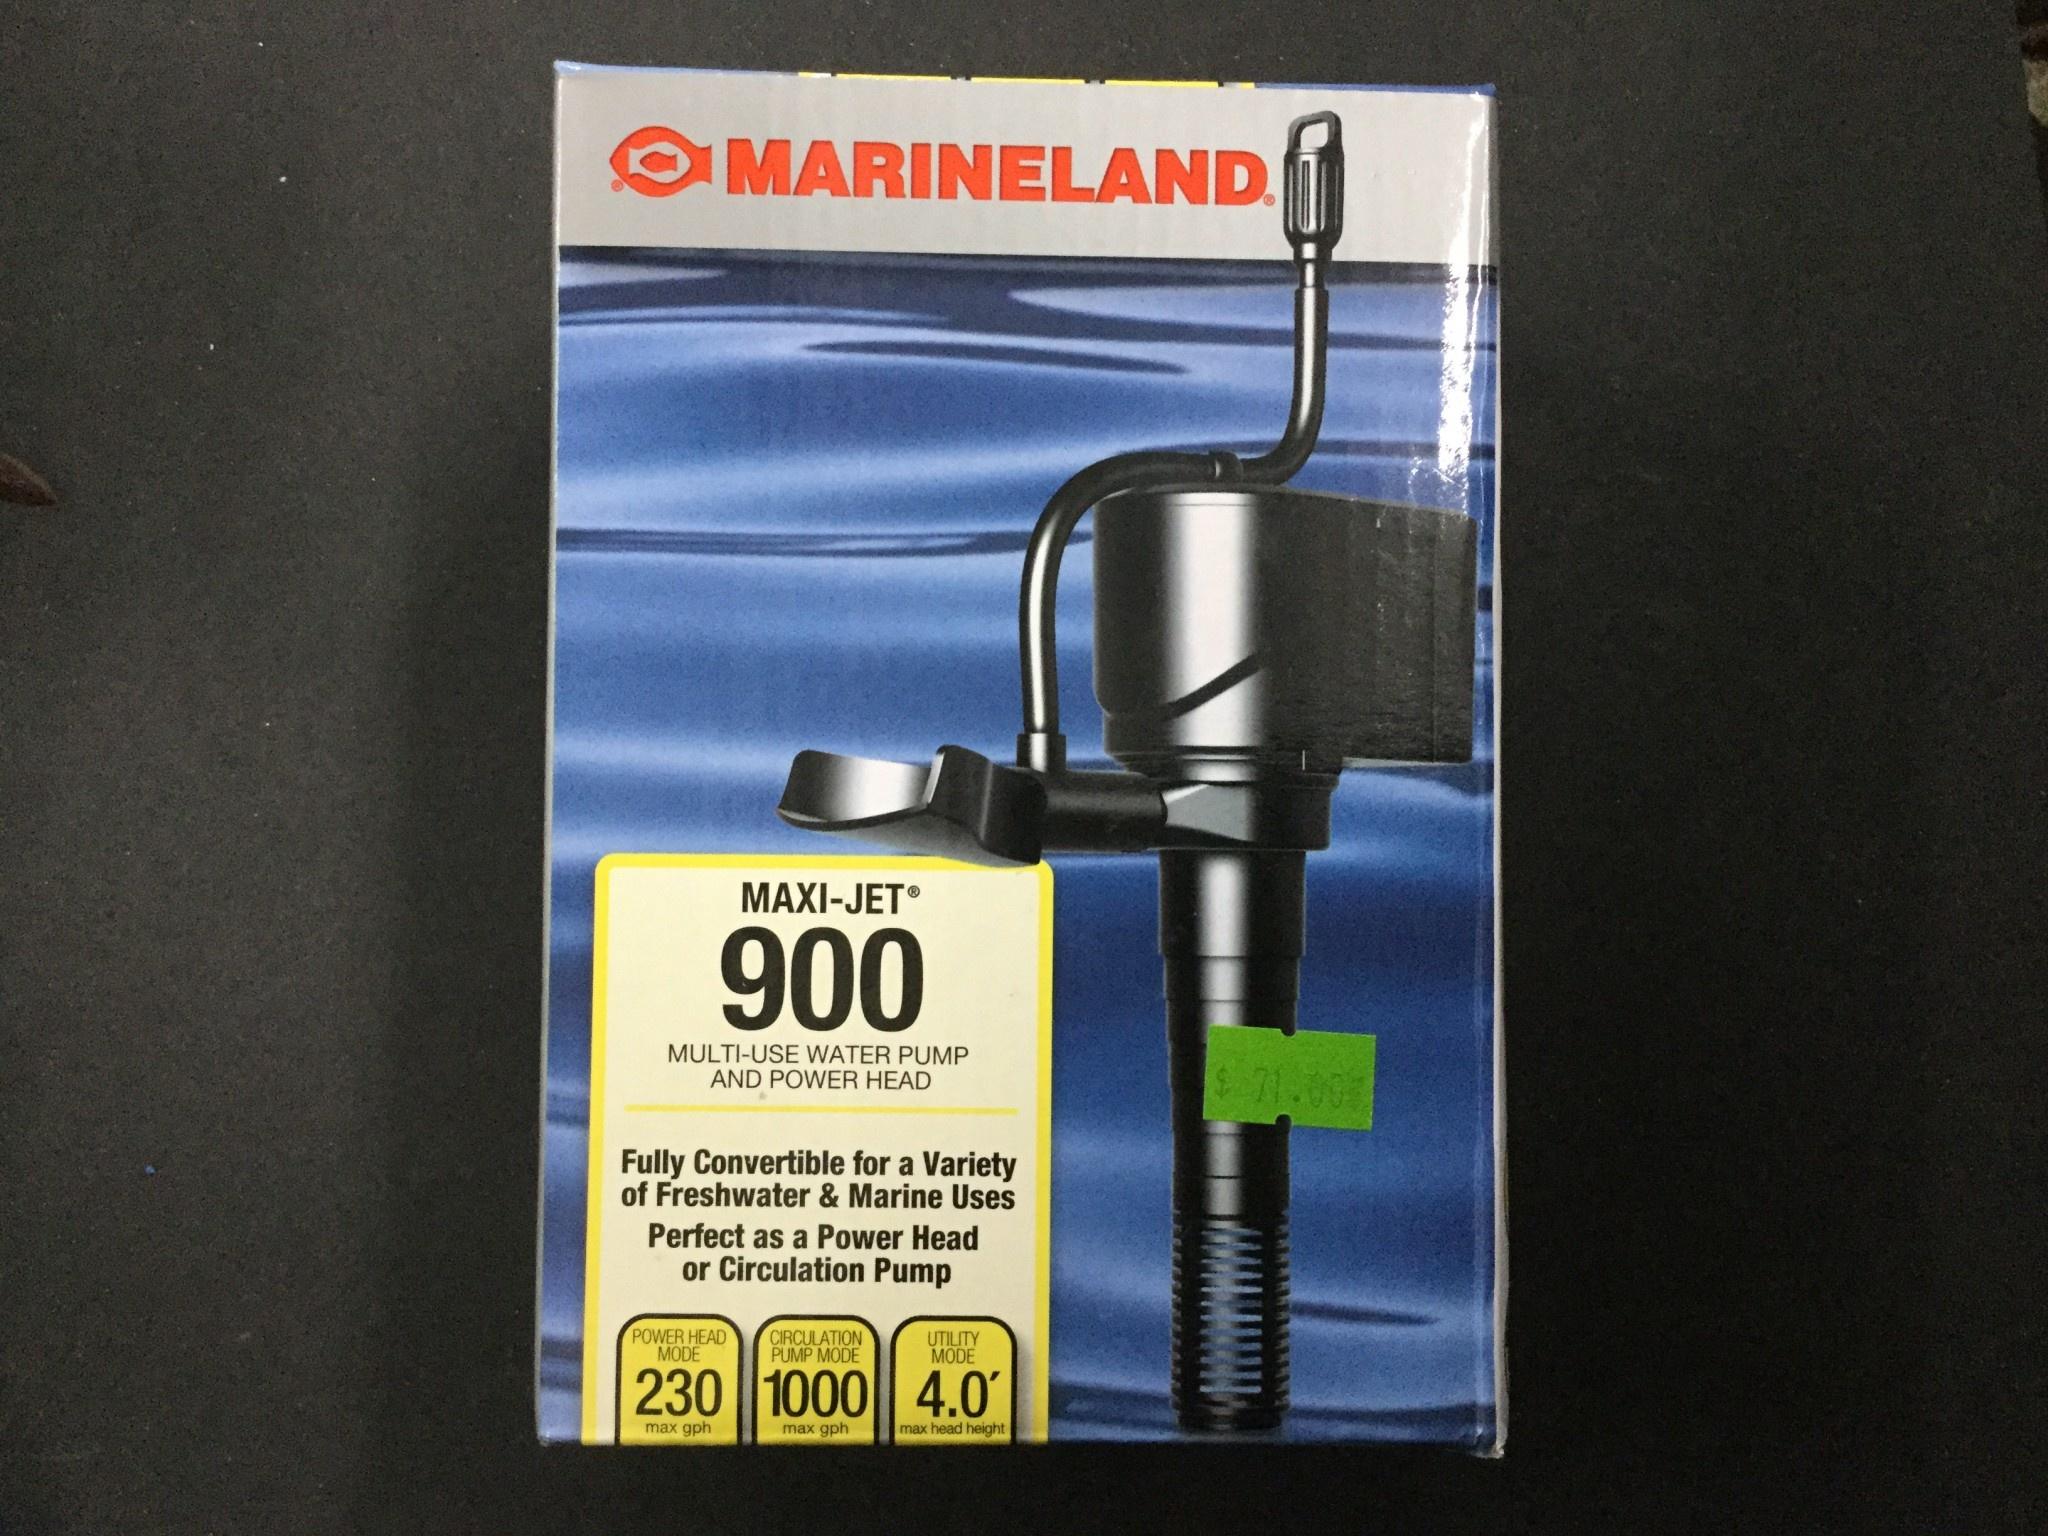 Marineland Maxi-Jet 900 Multi-Use Water Pump-1